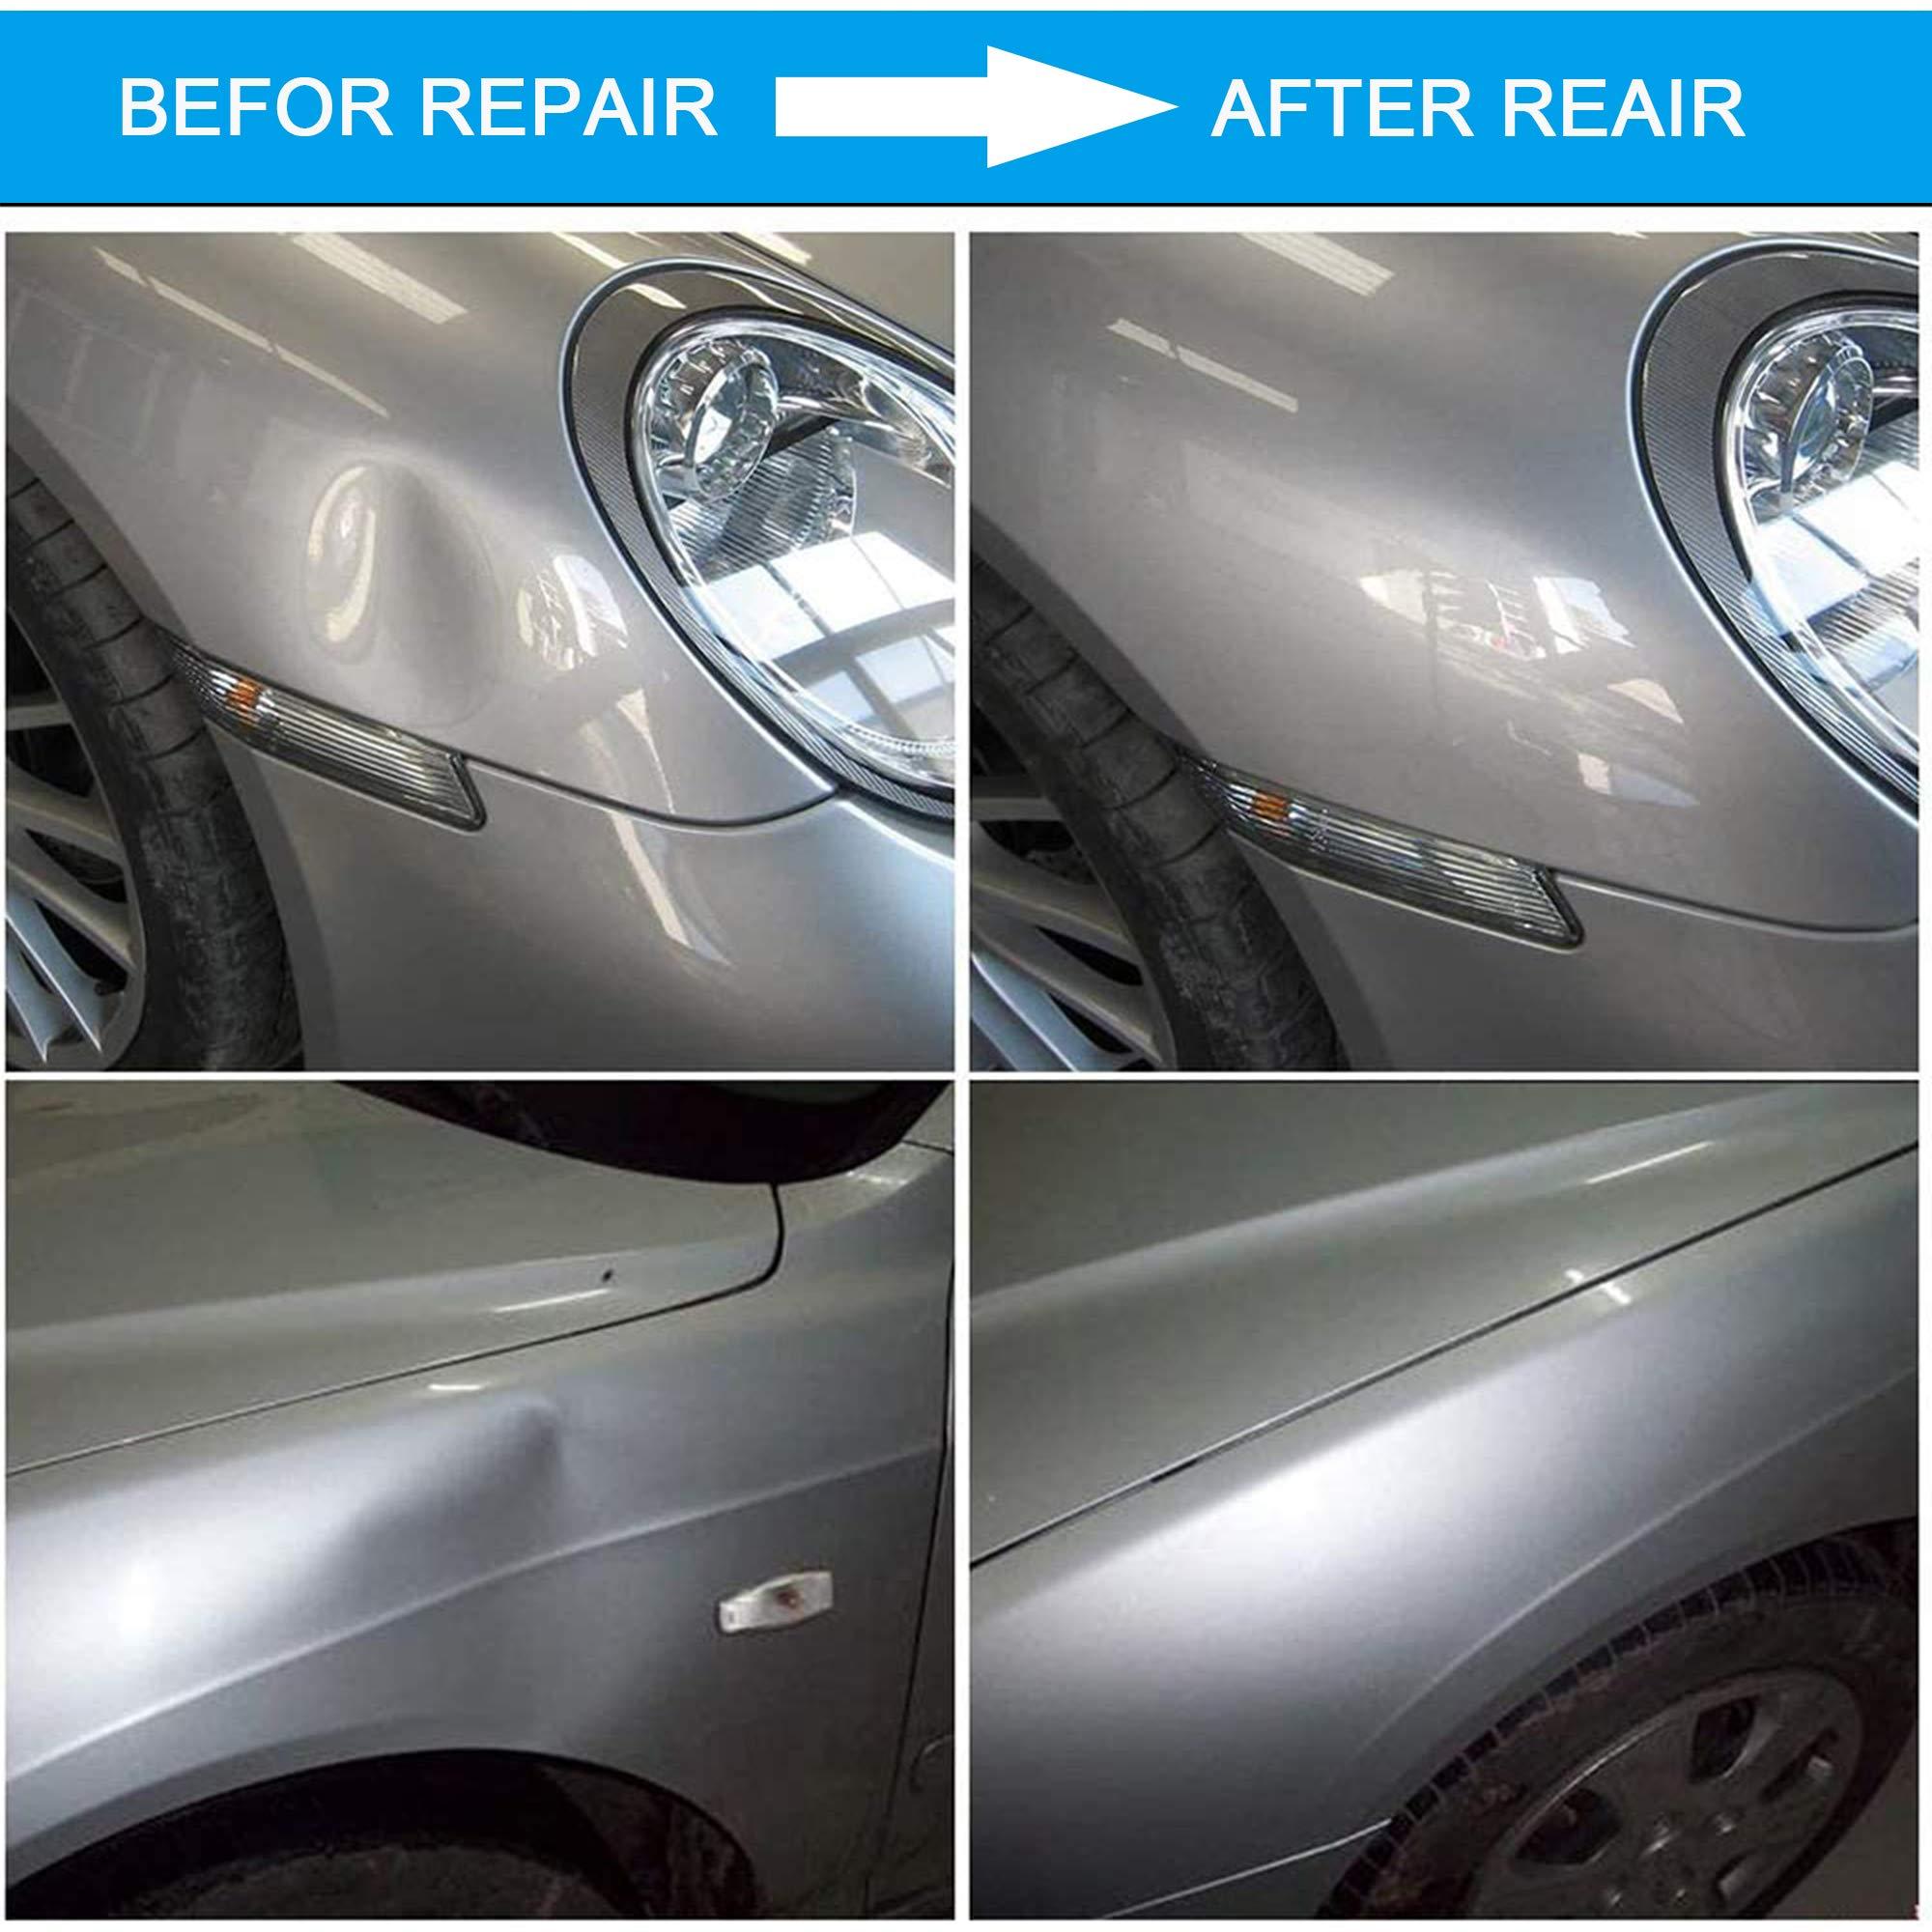 Car Dent Puller Kit with Bridge Dent Puller Minor Dent Removal ...